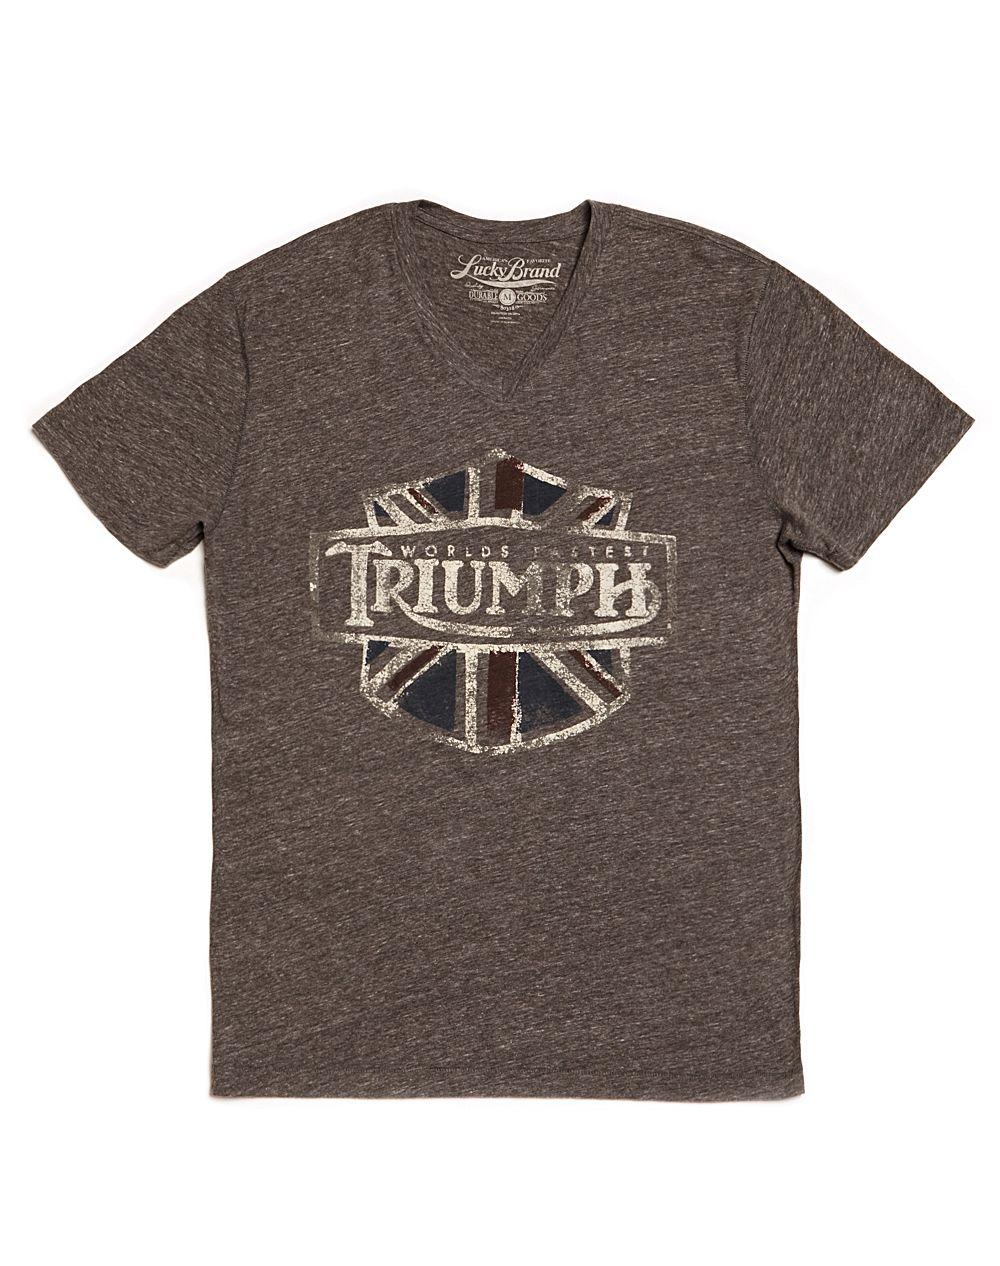 Lucky Brand Triumph Shield Vneck Tshirt In Brown For Men